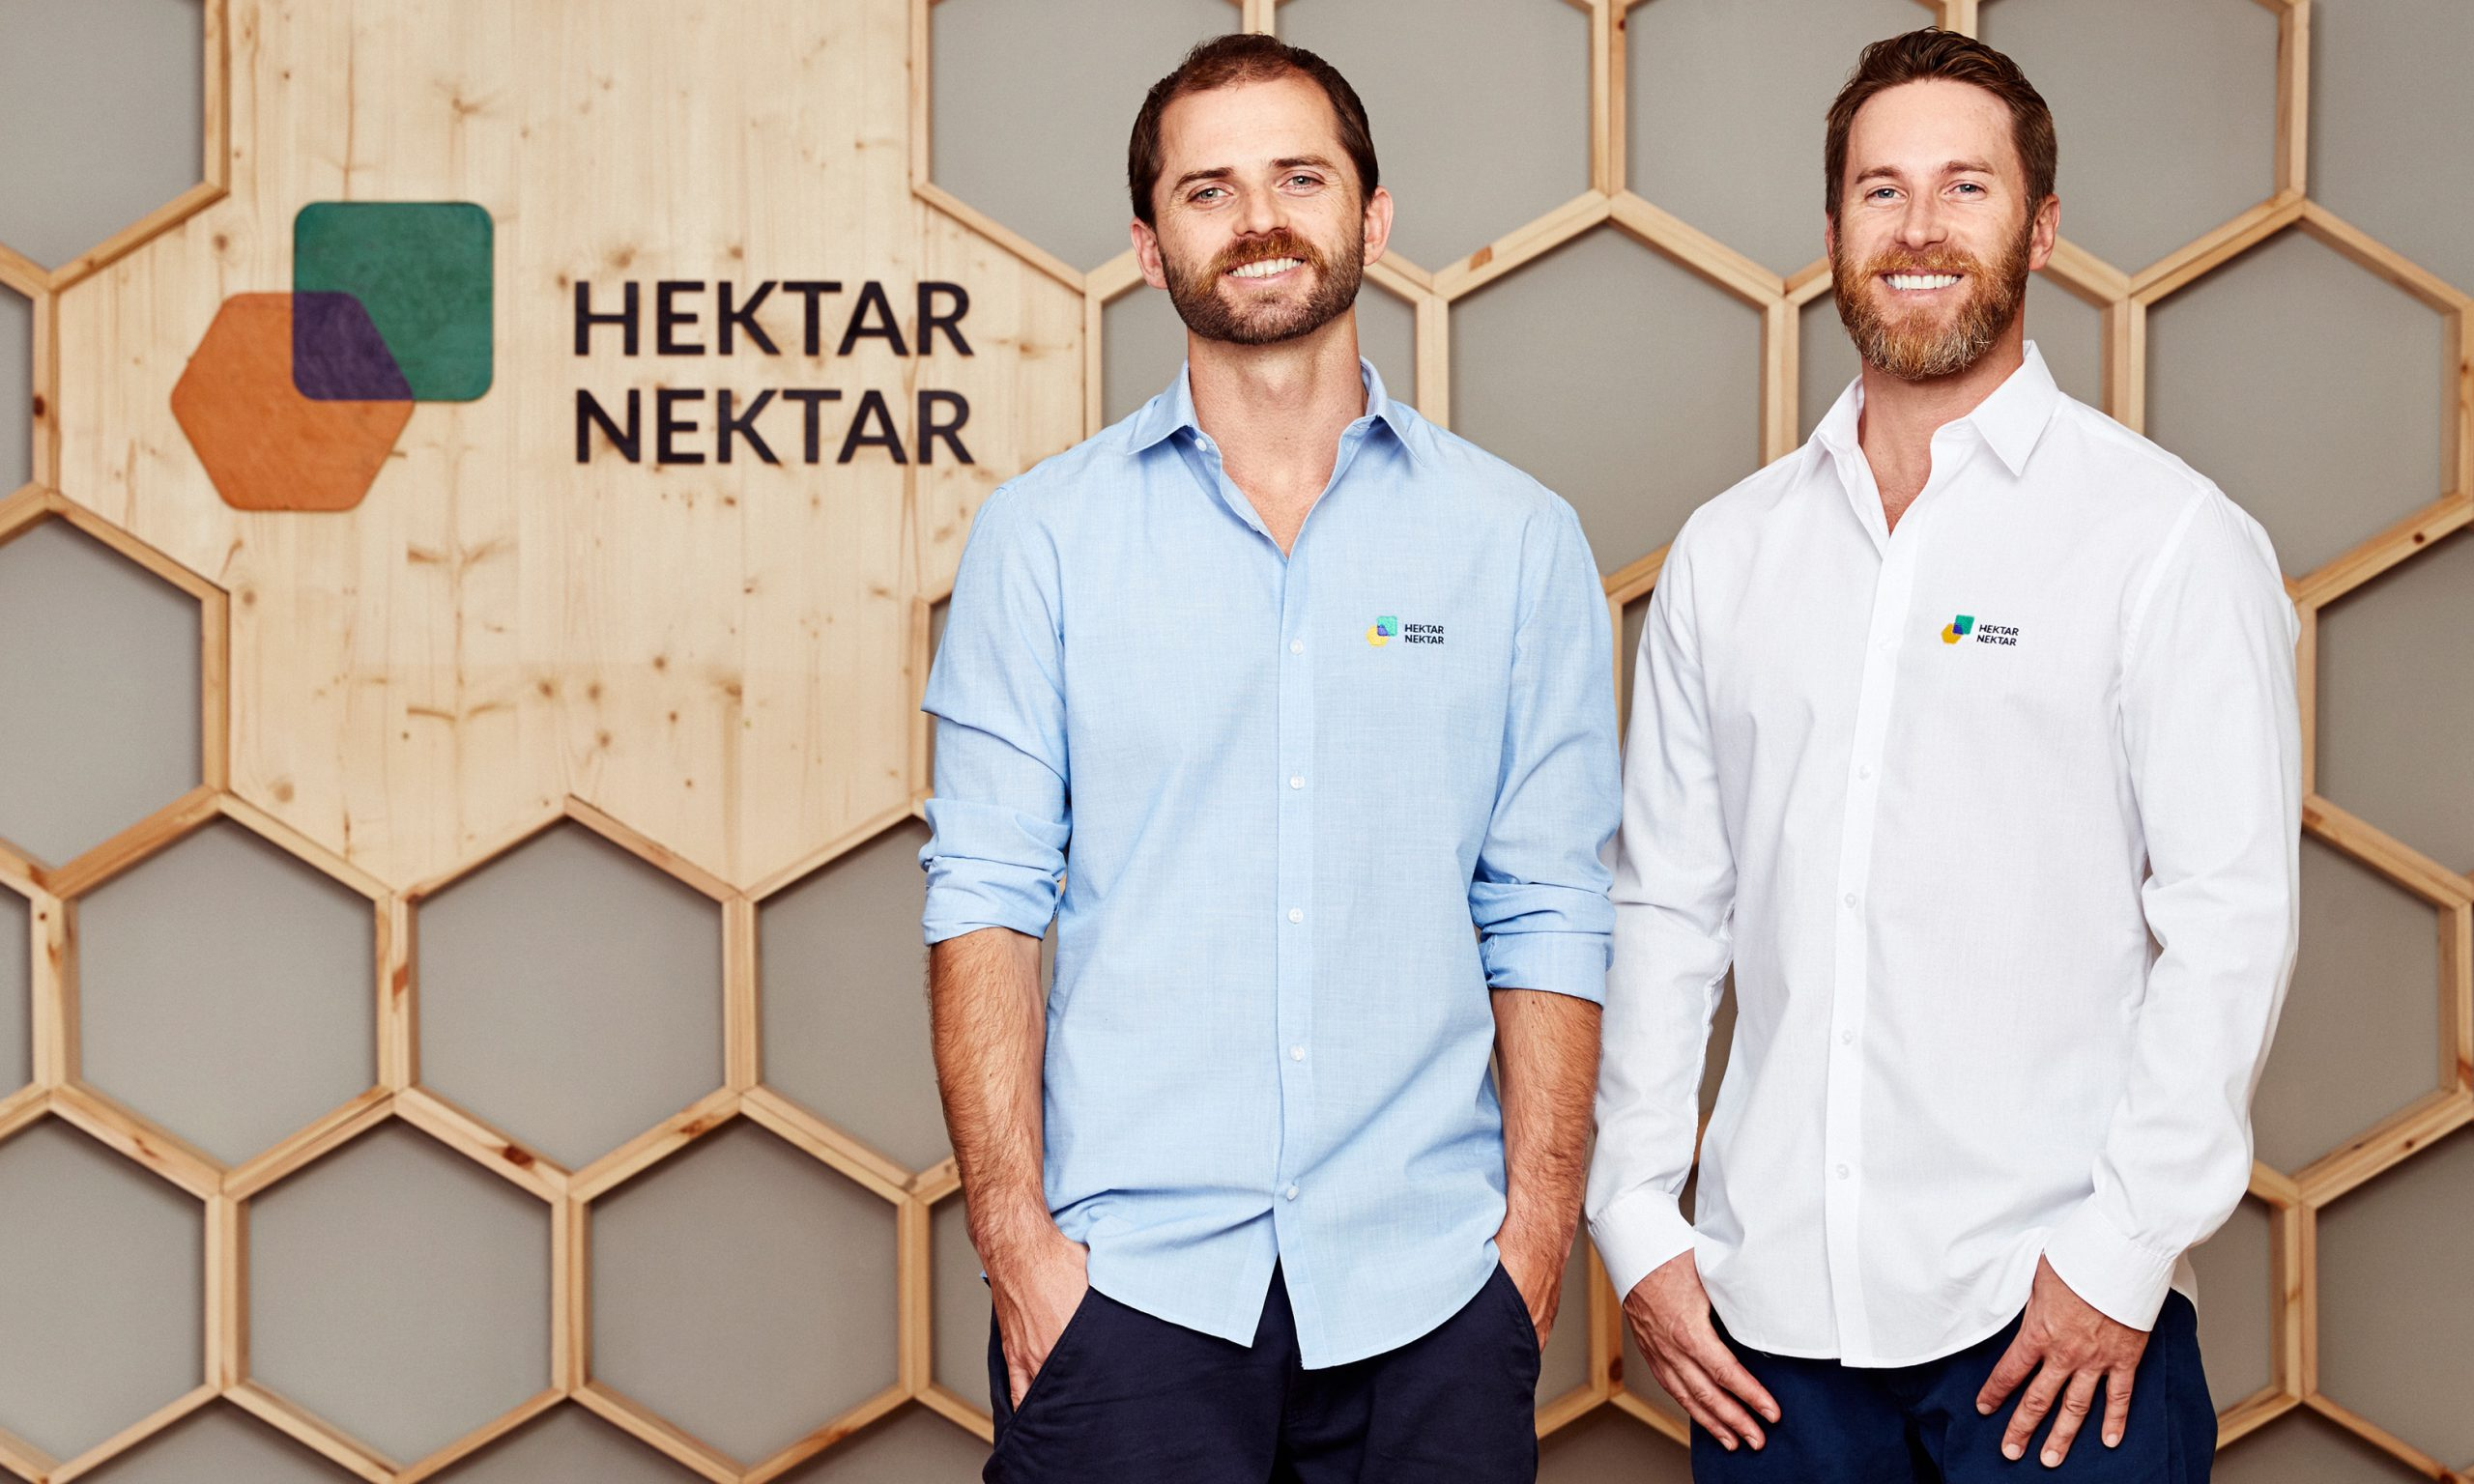 Mark und Martin Poreda vor dem Hektar Nektar Logo